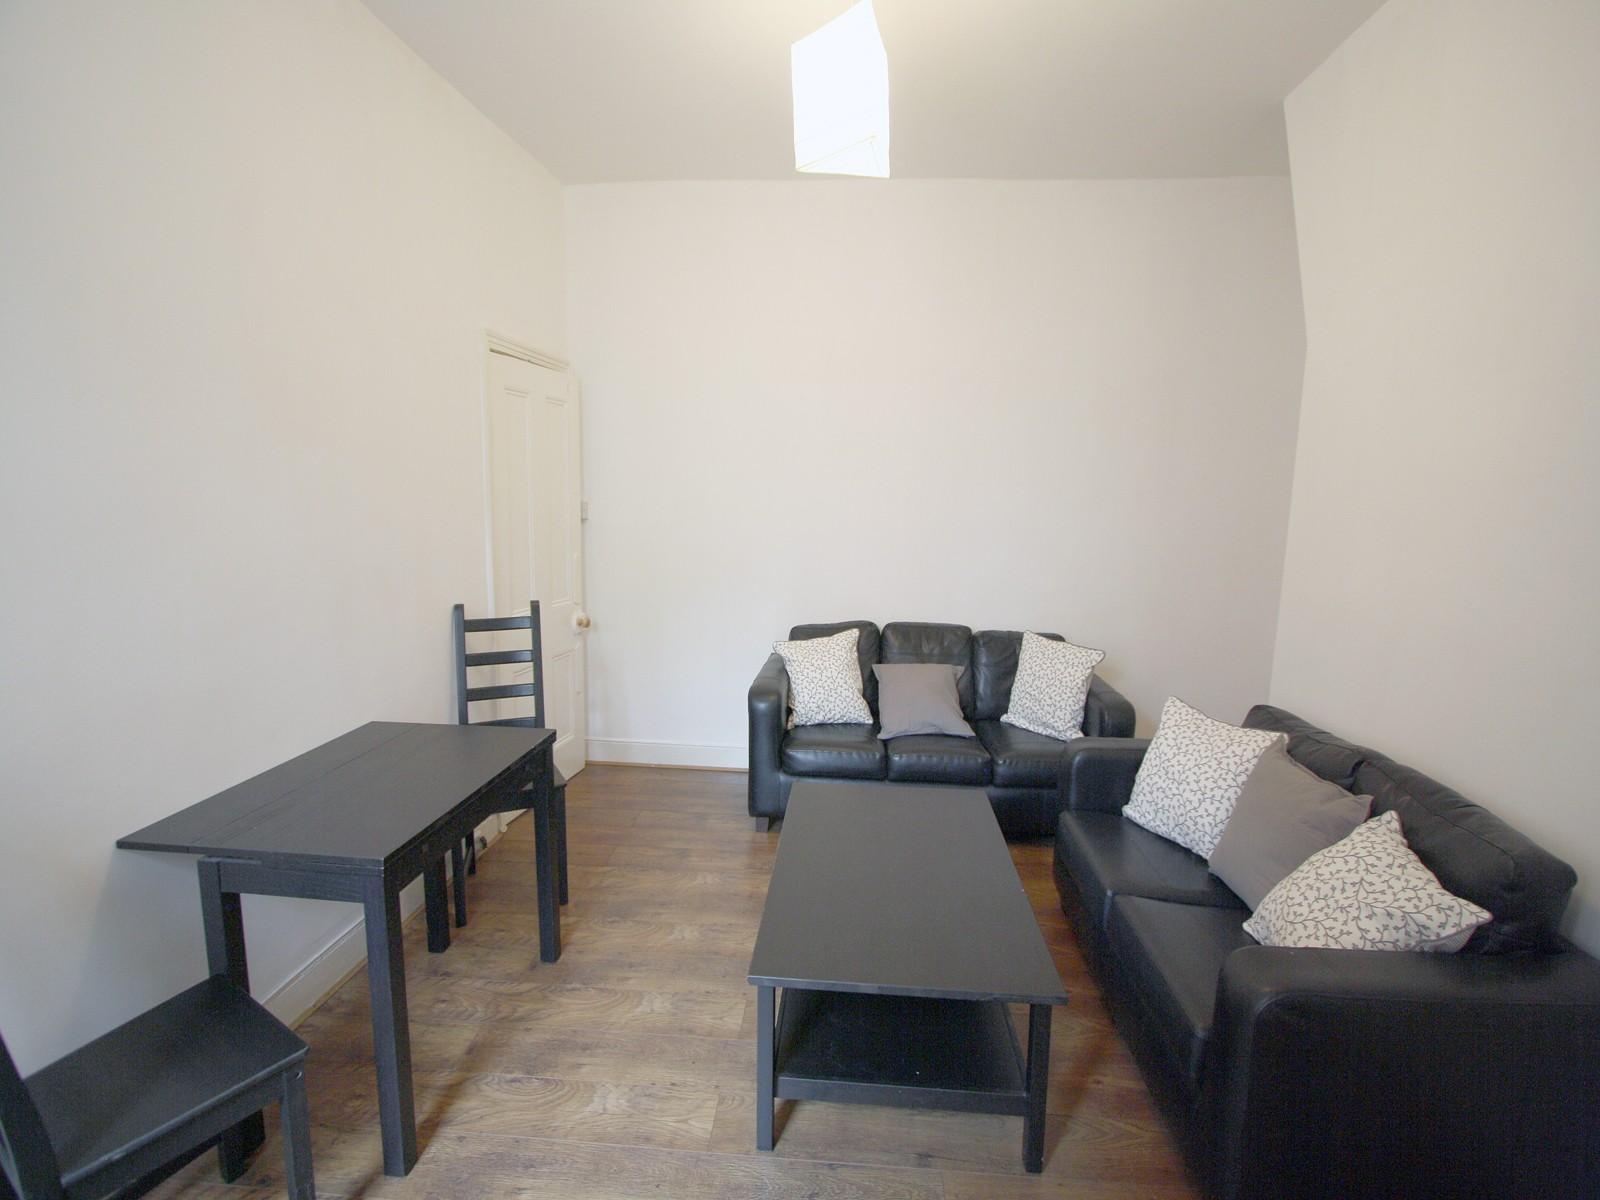 2 Bedroom Apartment To Rent Grosvenor Road Newcastle Upon Tyne Ne2 2rq